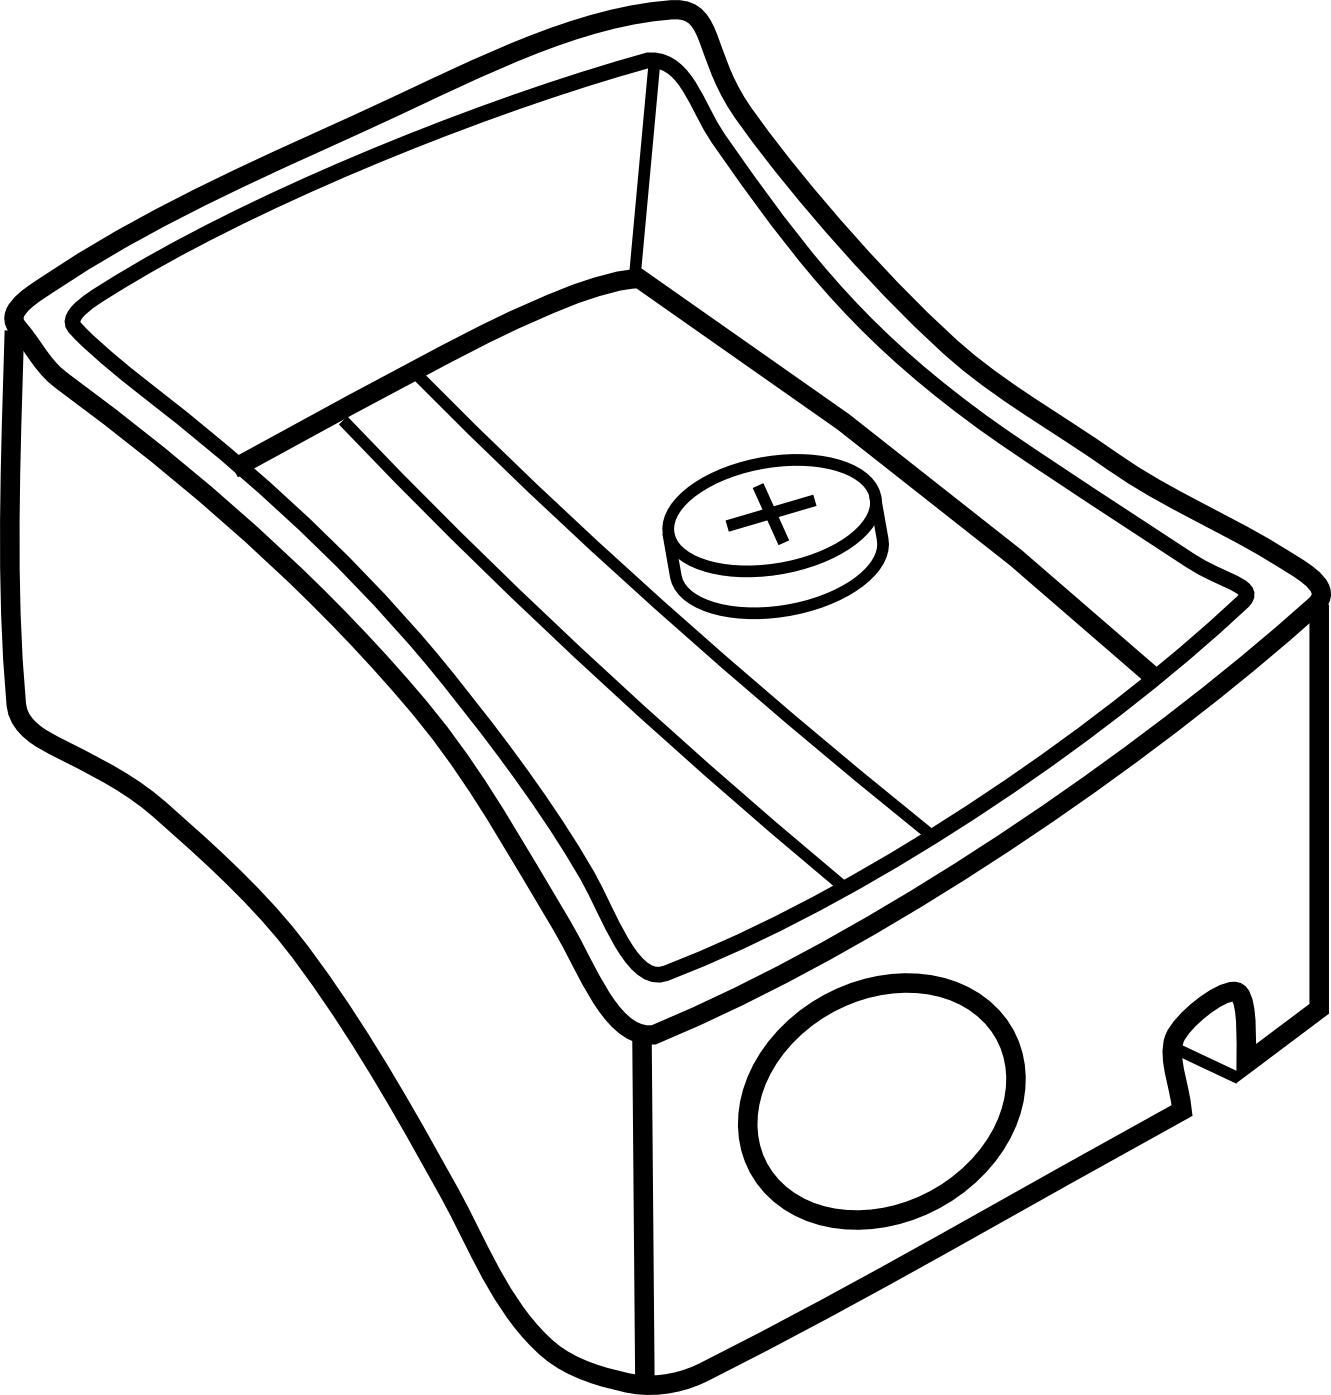 1331x1395 Pencil Clipart Black And White Clipart Panda